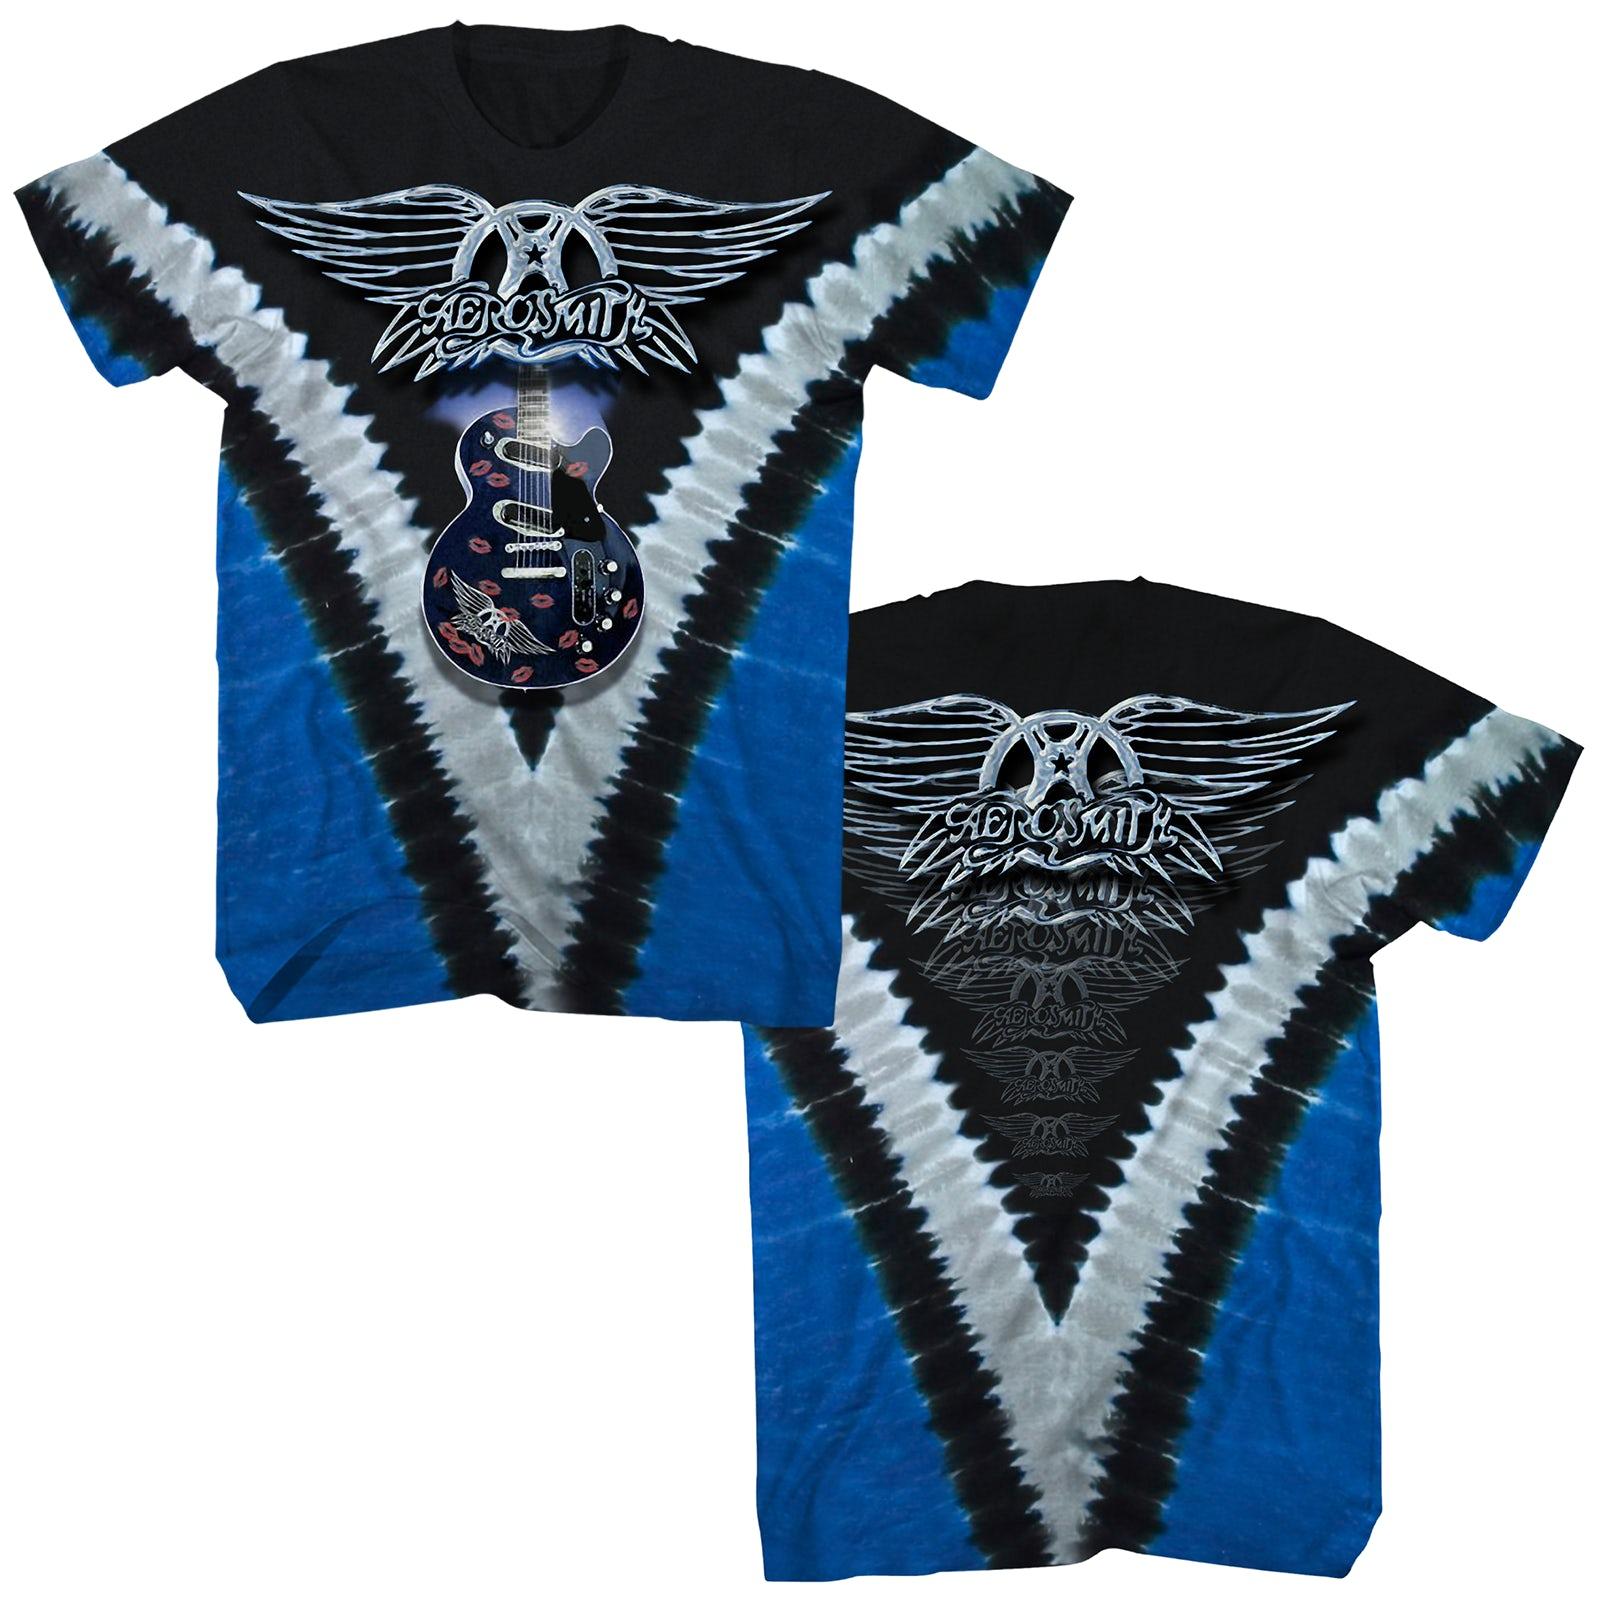 Under Armour HeatGear Threadborne Sportstyle Crew Shirt Women T-Shirt 1290609